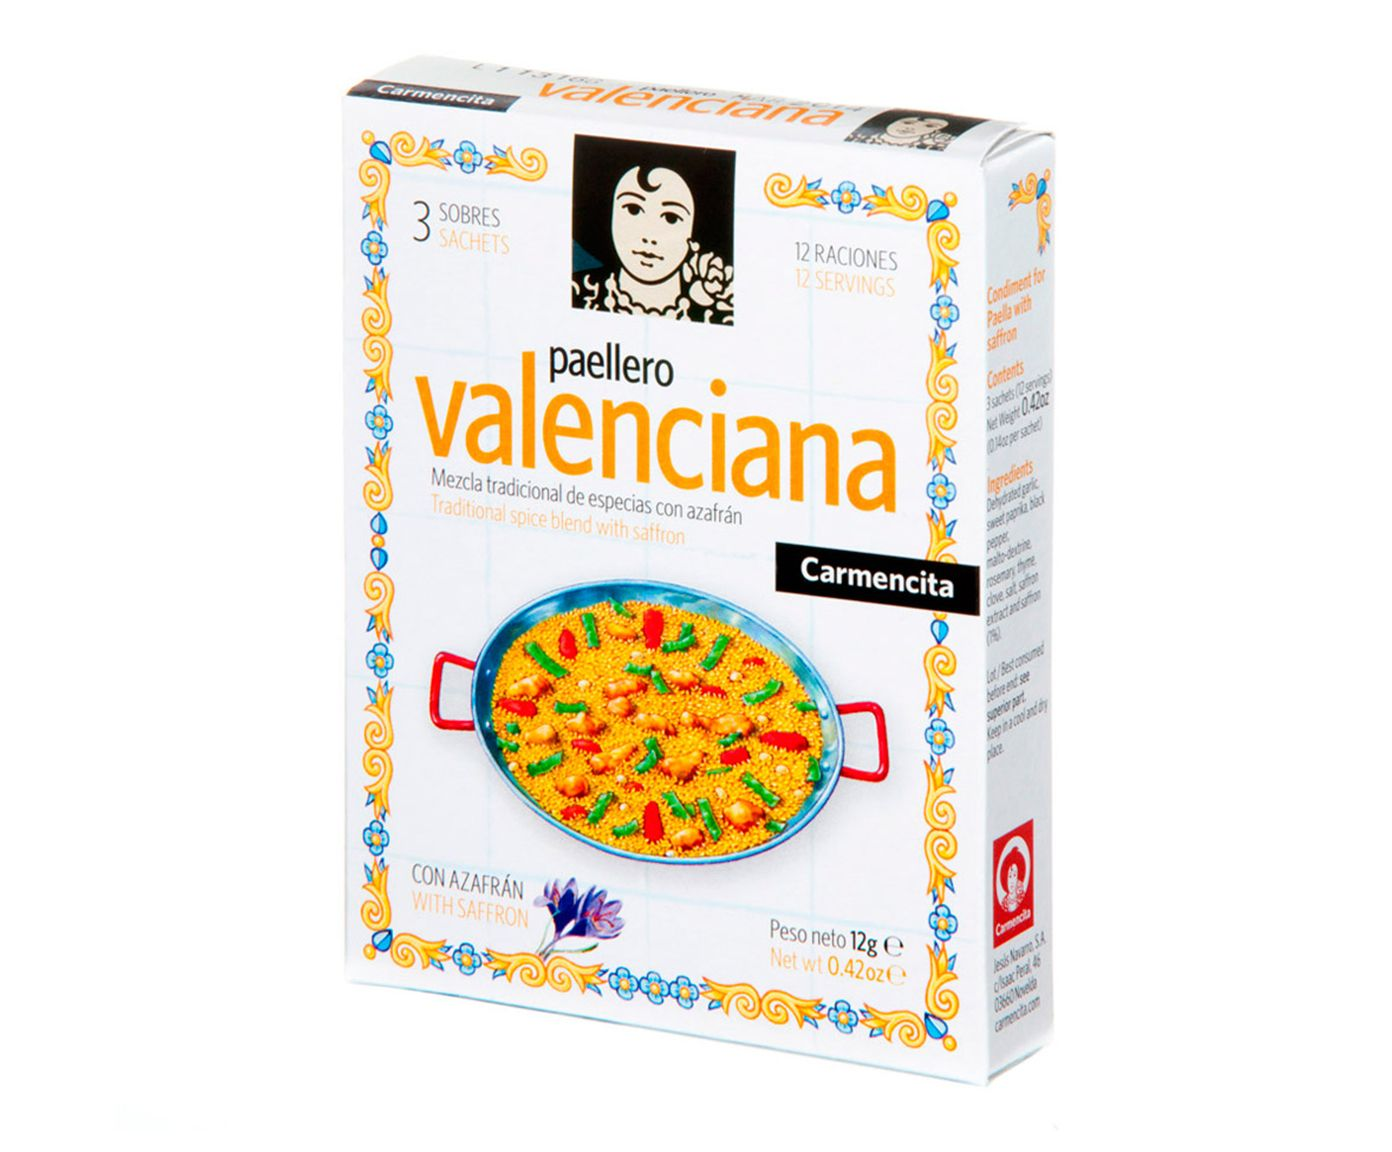 Tempero Paellero Valenciana - 12G | Westwing.com.br